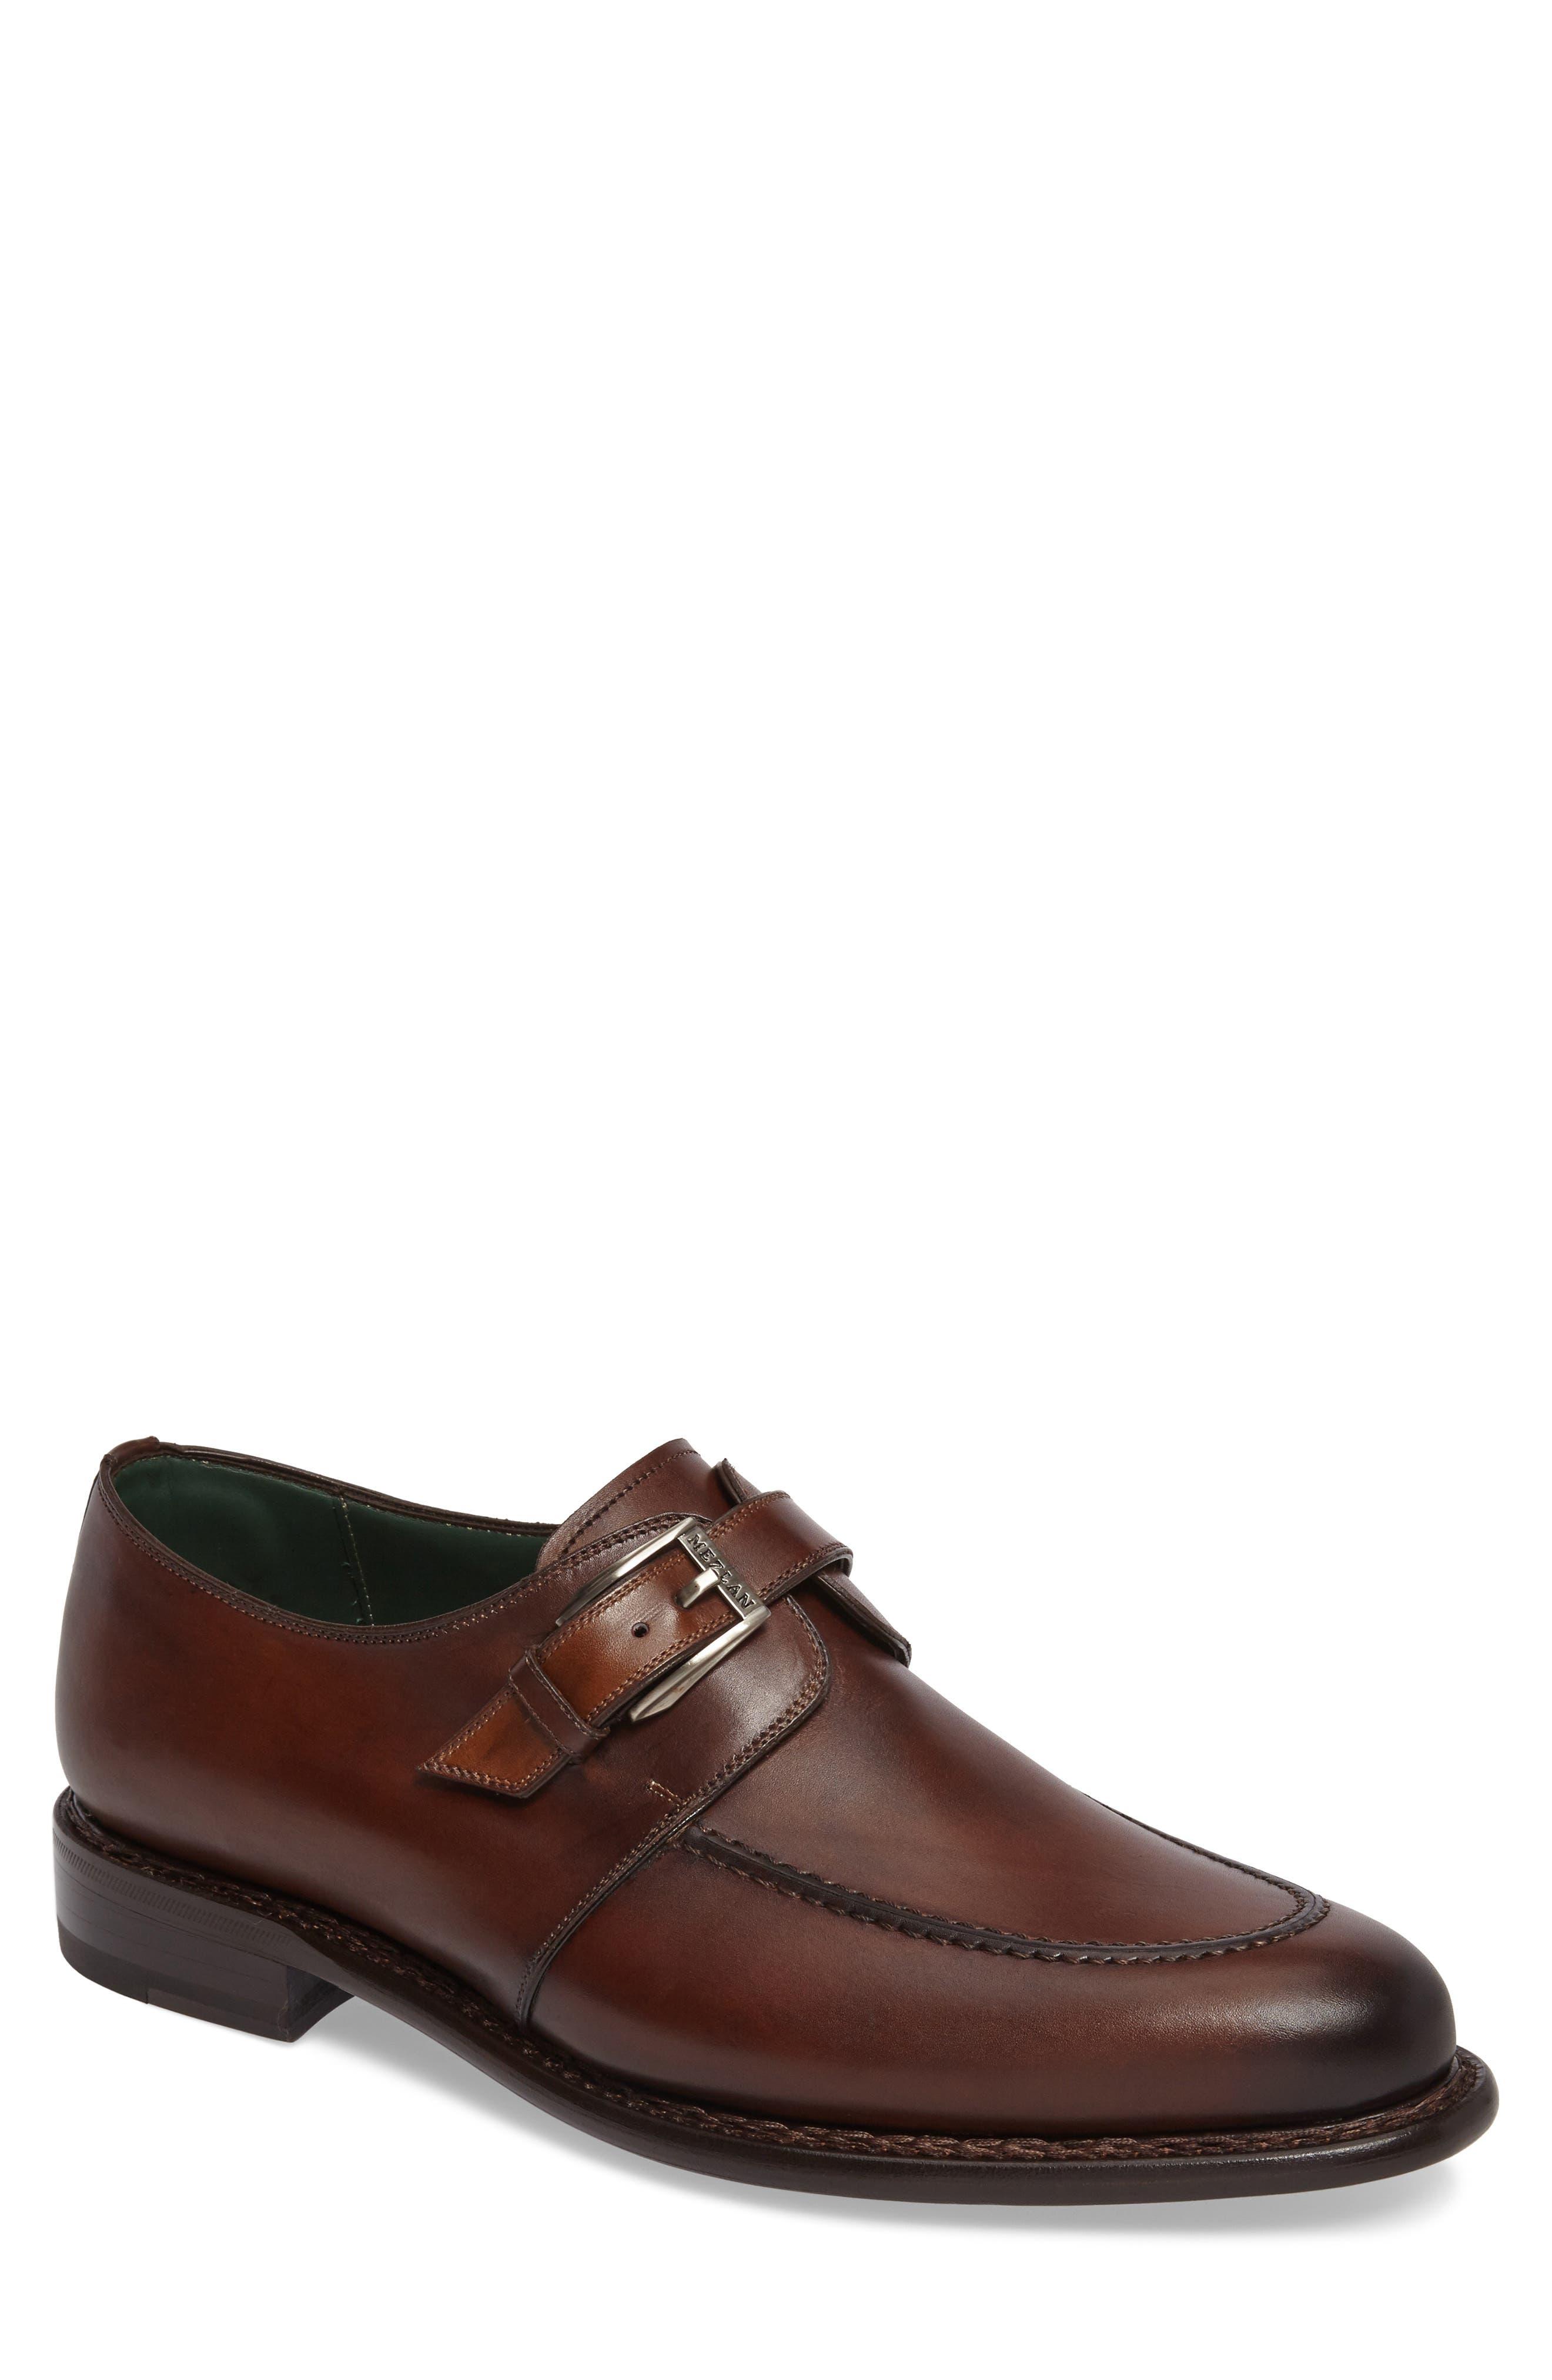 Alternate Image 1 Selected - Mezlan Aguilar Monk Strap Shoe (Men)